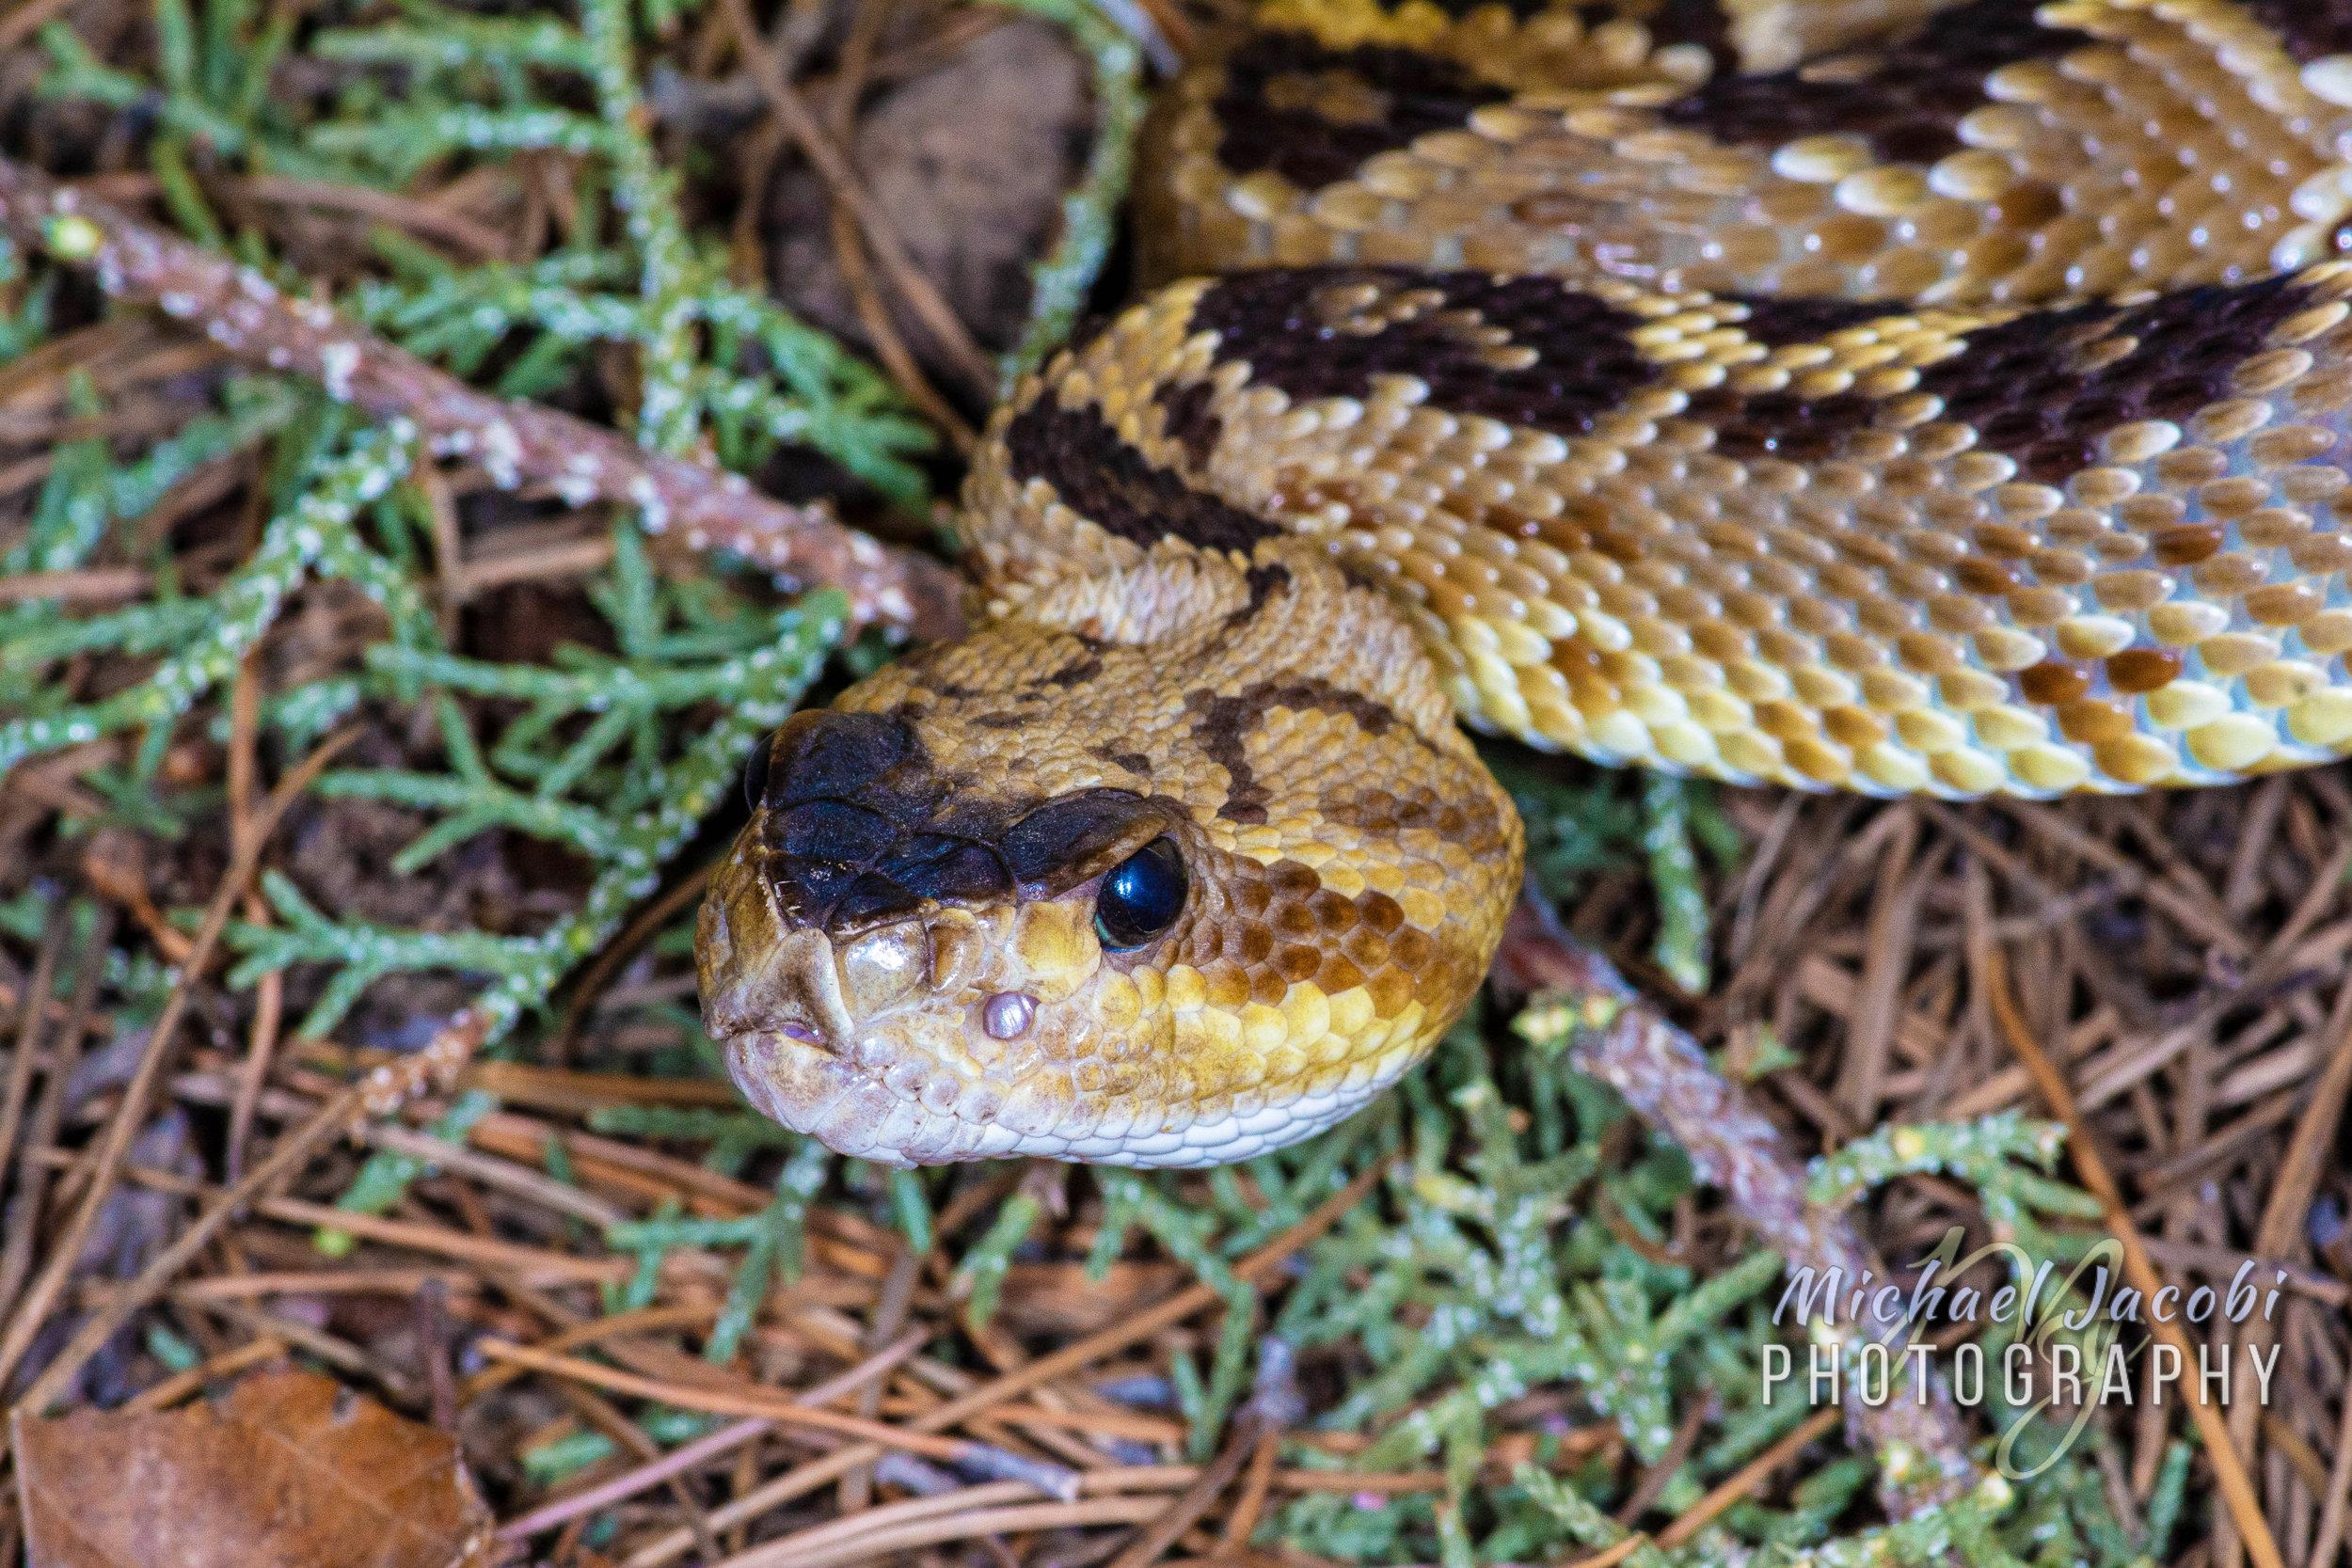 Western Black-tailed Rattlesnake ( Crotalus molossus ), Chiricahua Mountains